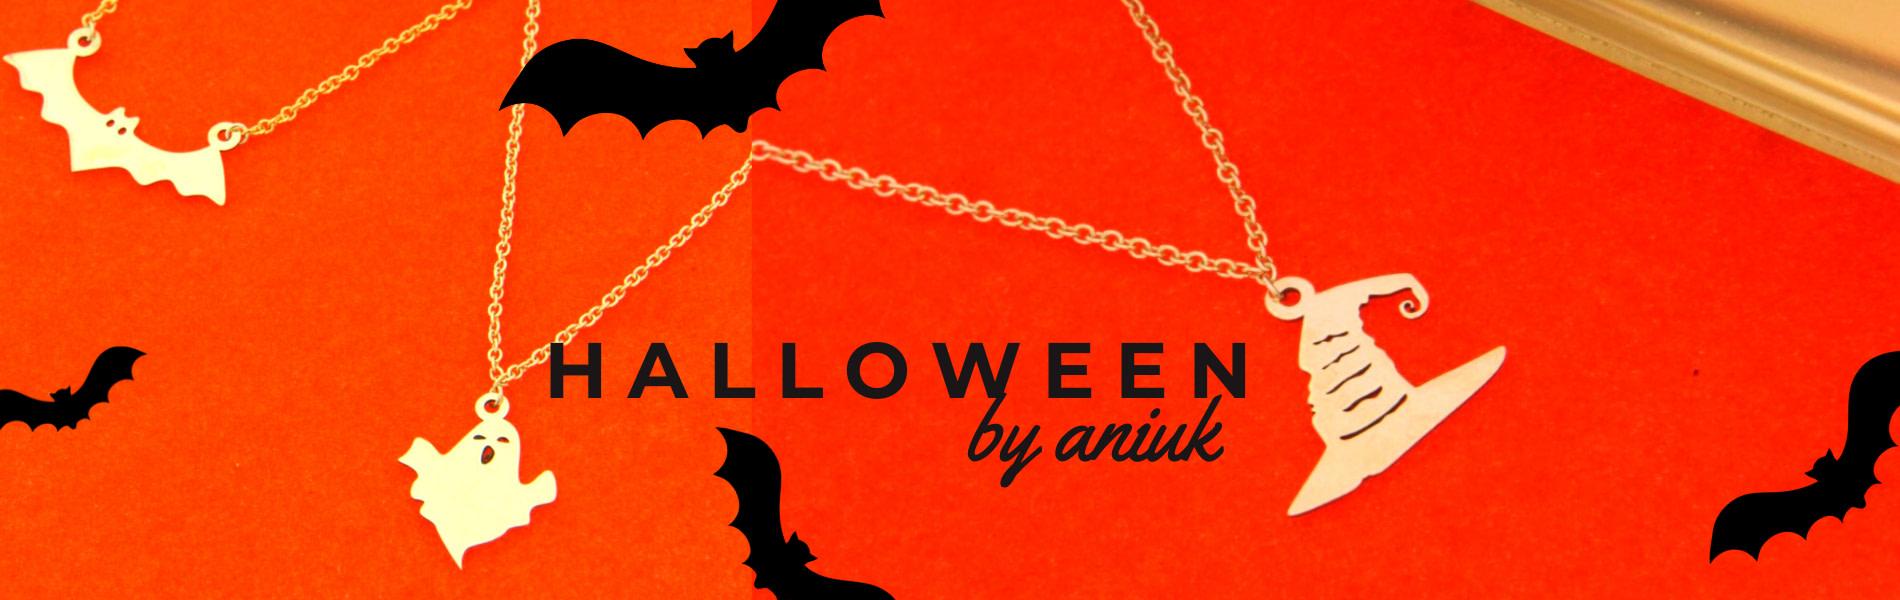 halloween by aniuk